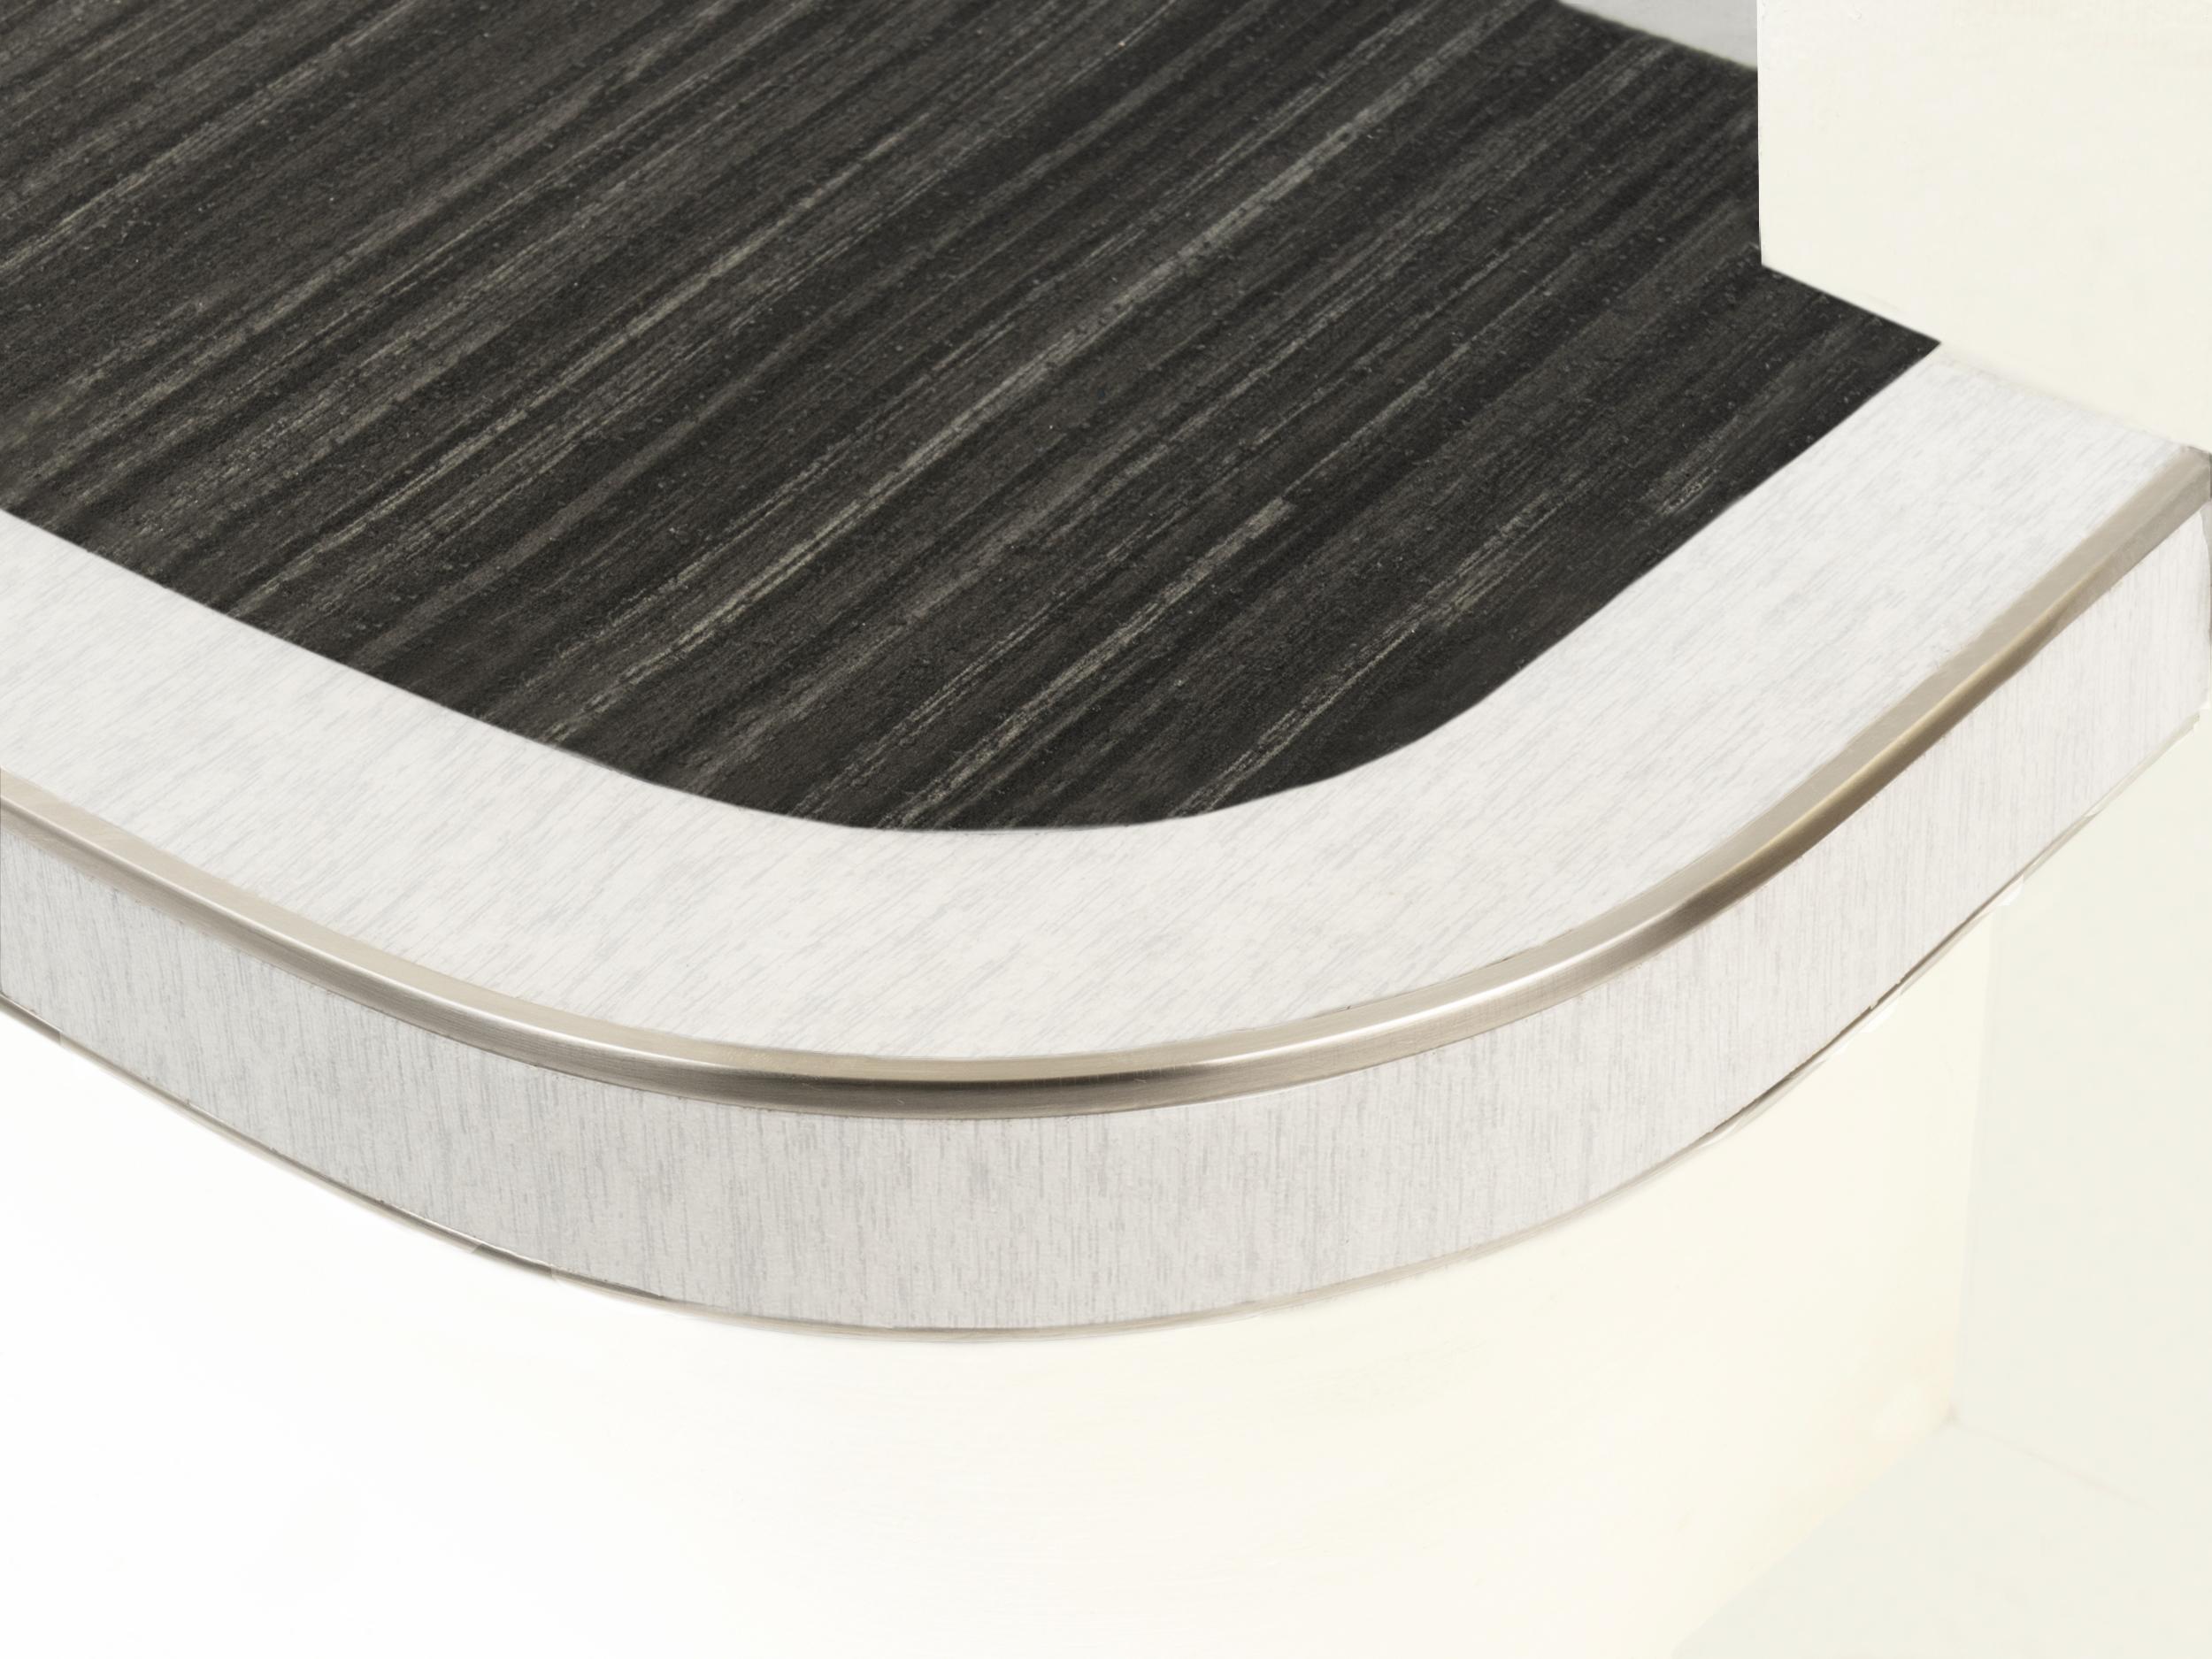 stairrods-safety-floor-satin-nickel-bendy-bull_edited-1.jpg